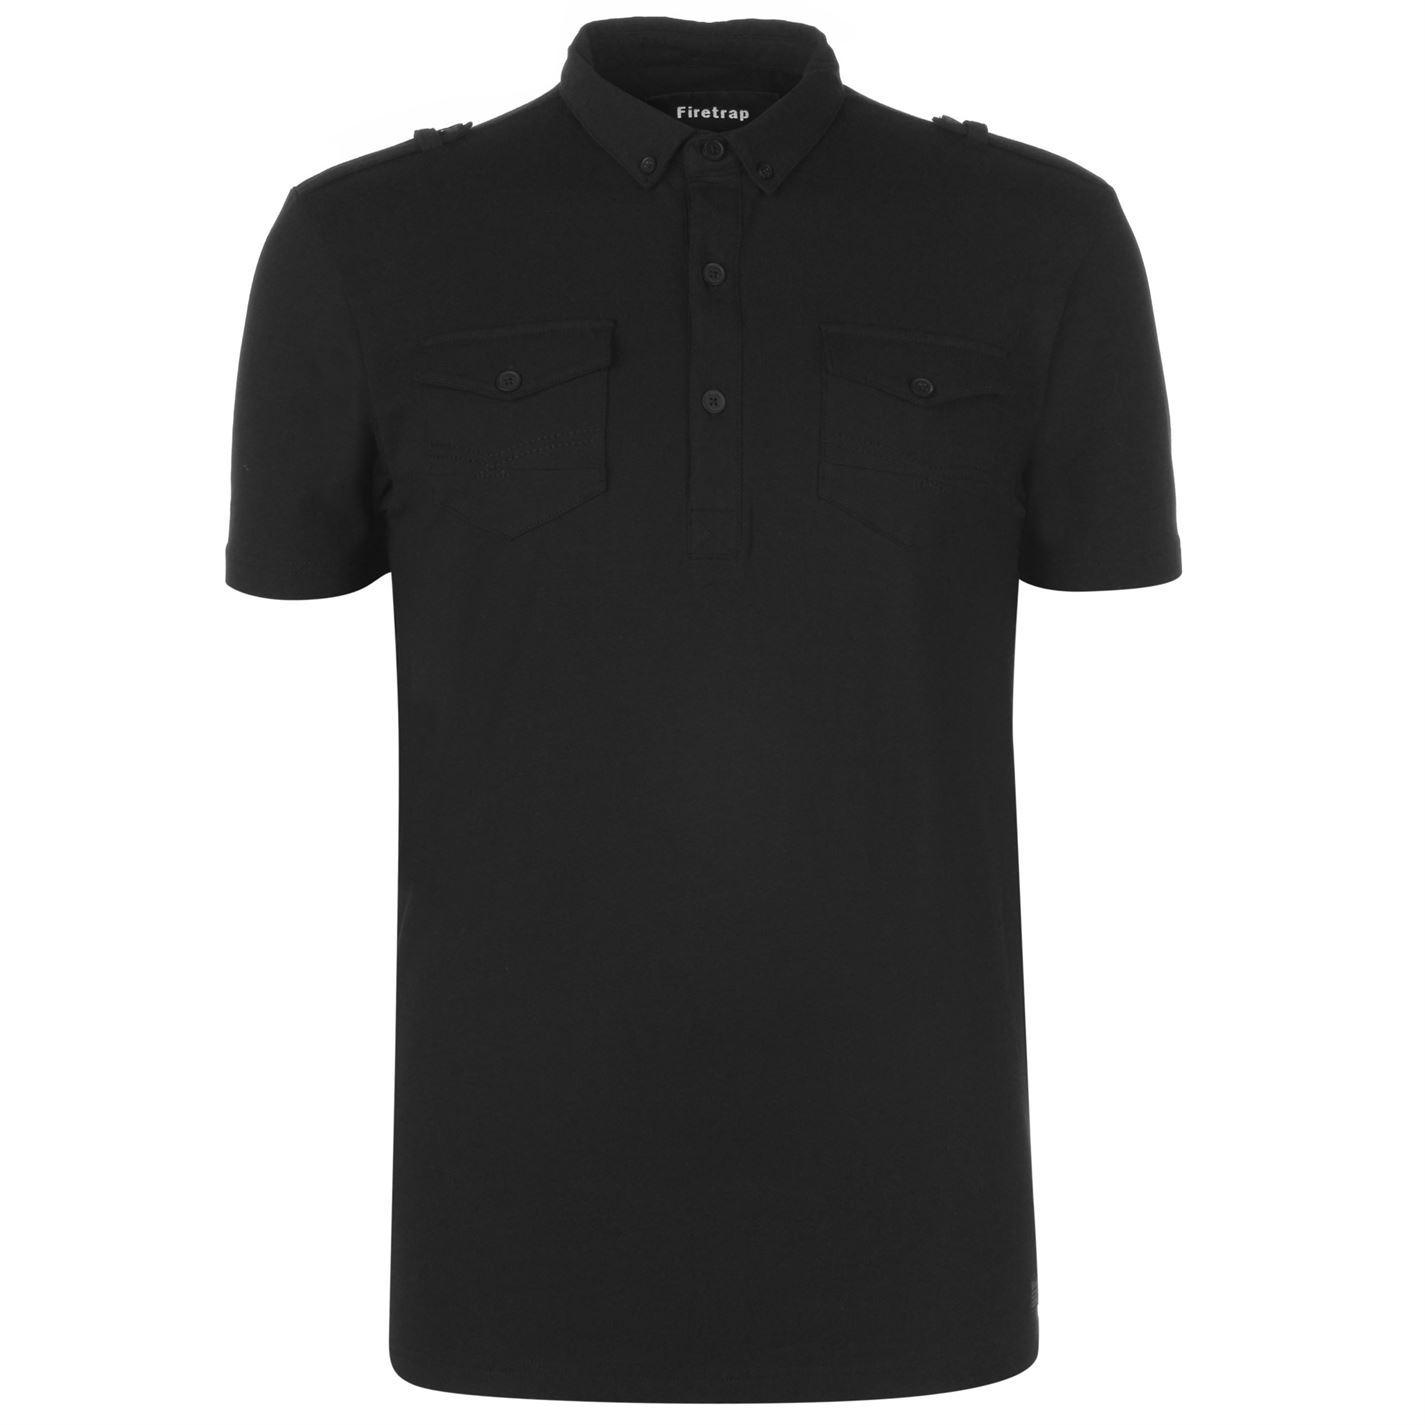 thumbnail 7 - Firetrap-Double-Pocket-Polo-Shirt-Mens-Collar-Top-Tee-Black-Medium